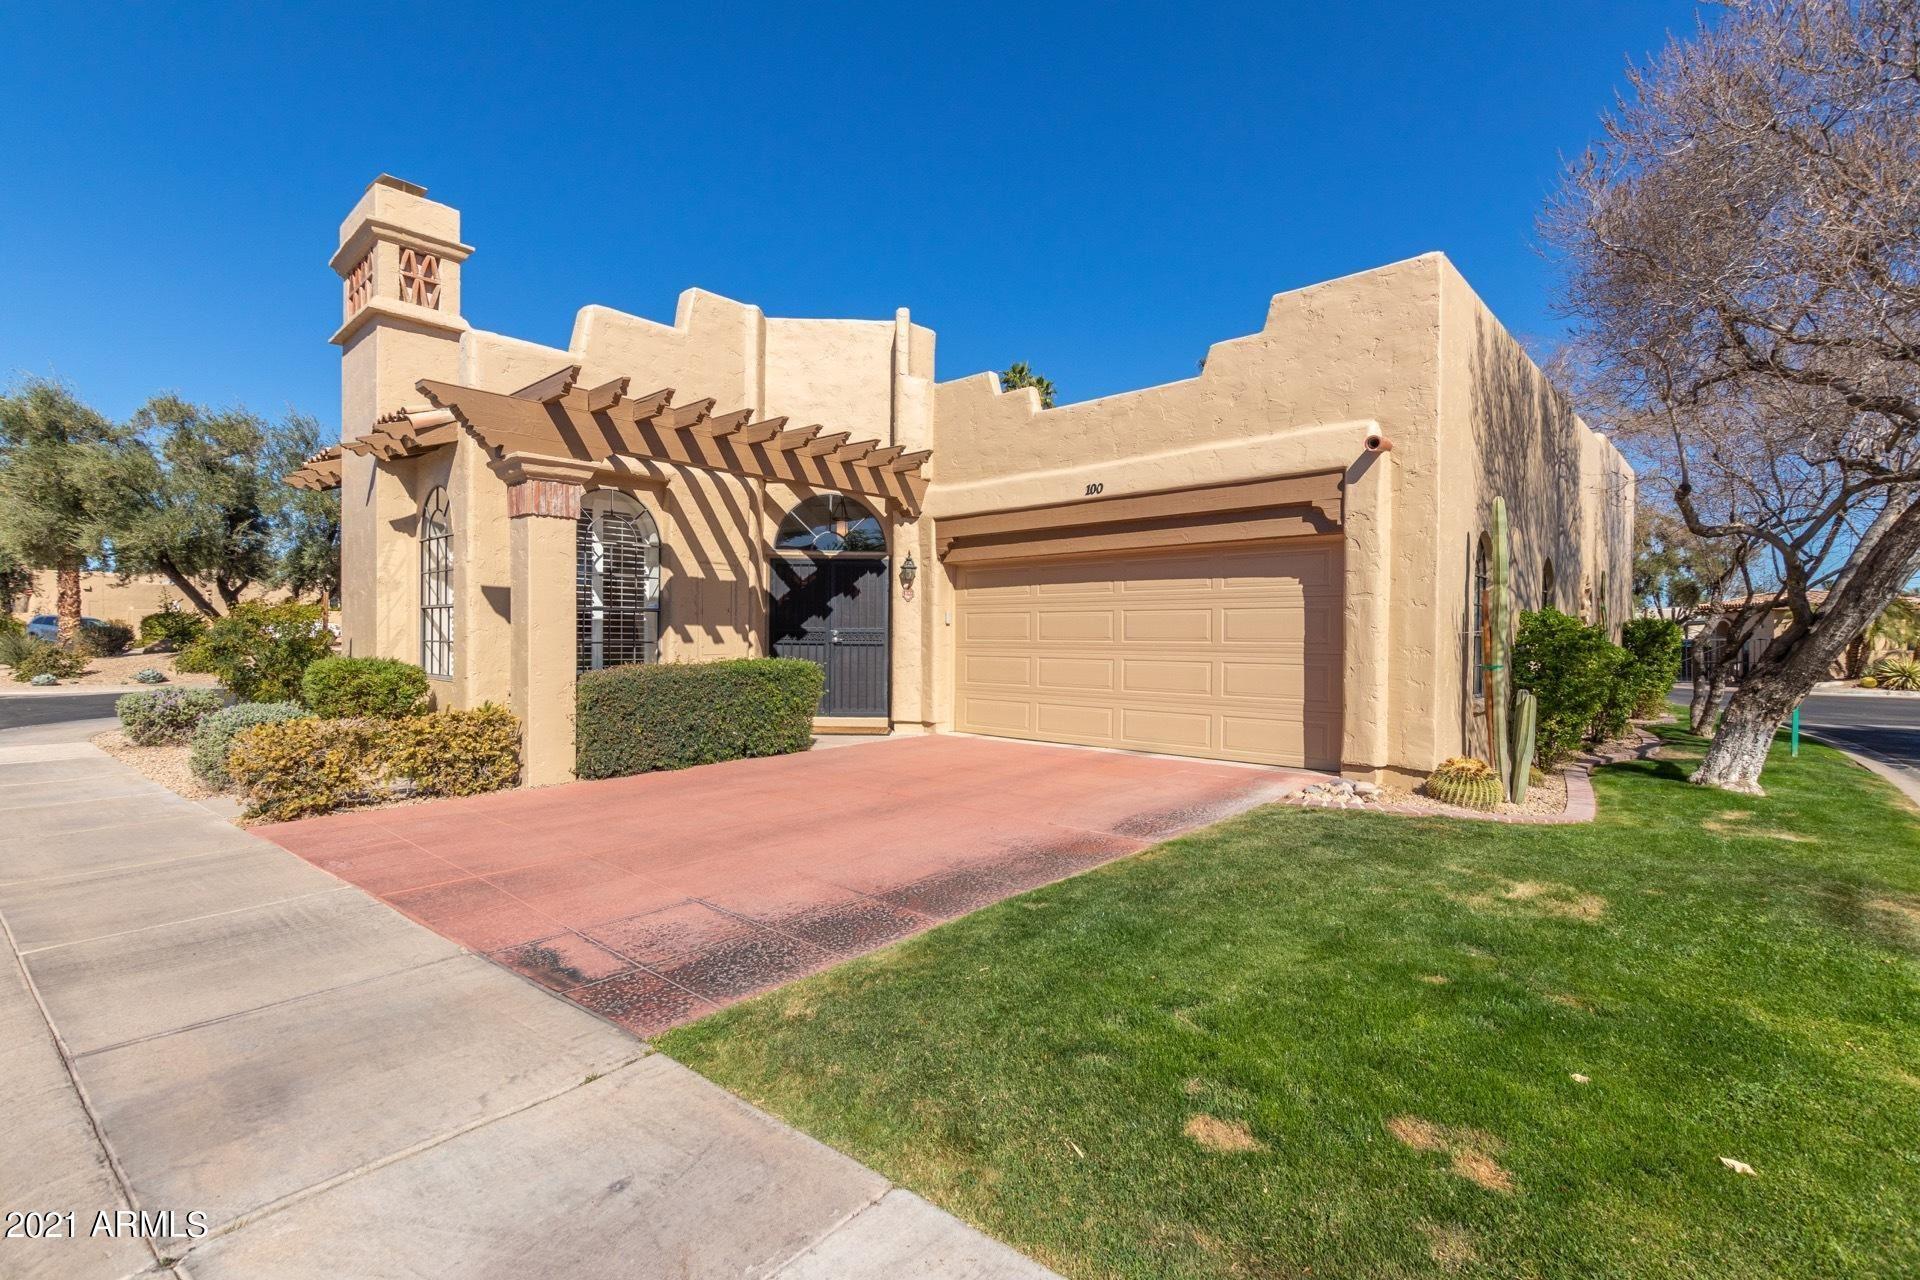 Photo for 7955 E CHAPARRAL Road #100, Scottsdale, AZ 85250 (MLS # 6197925)